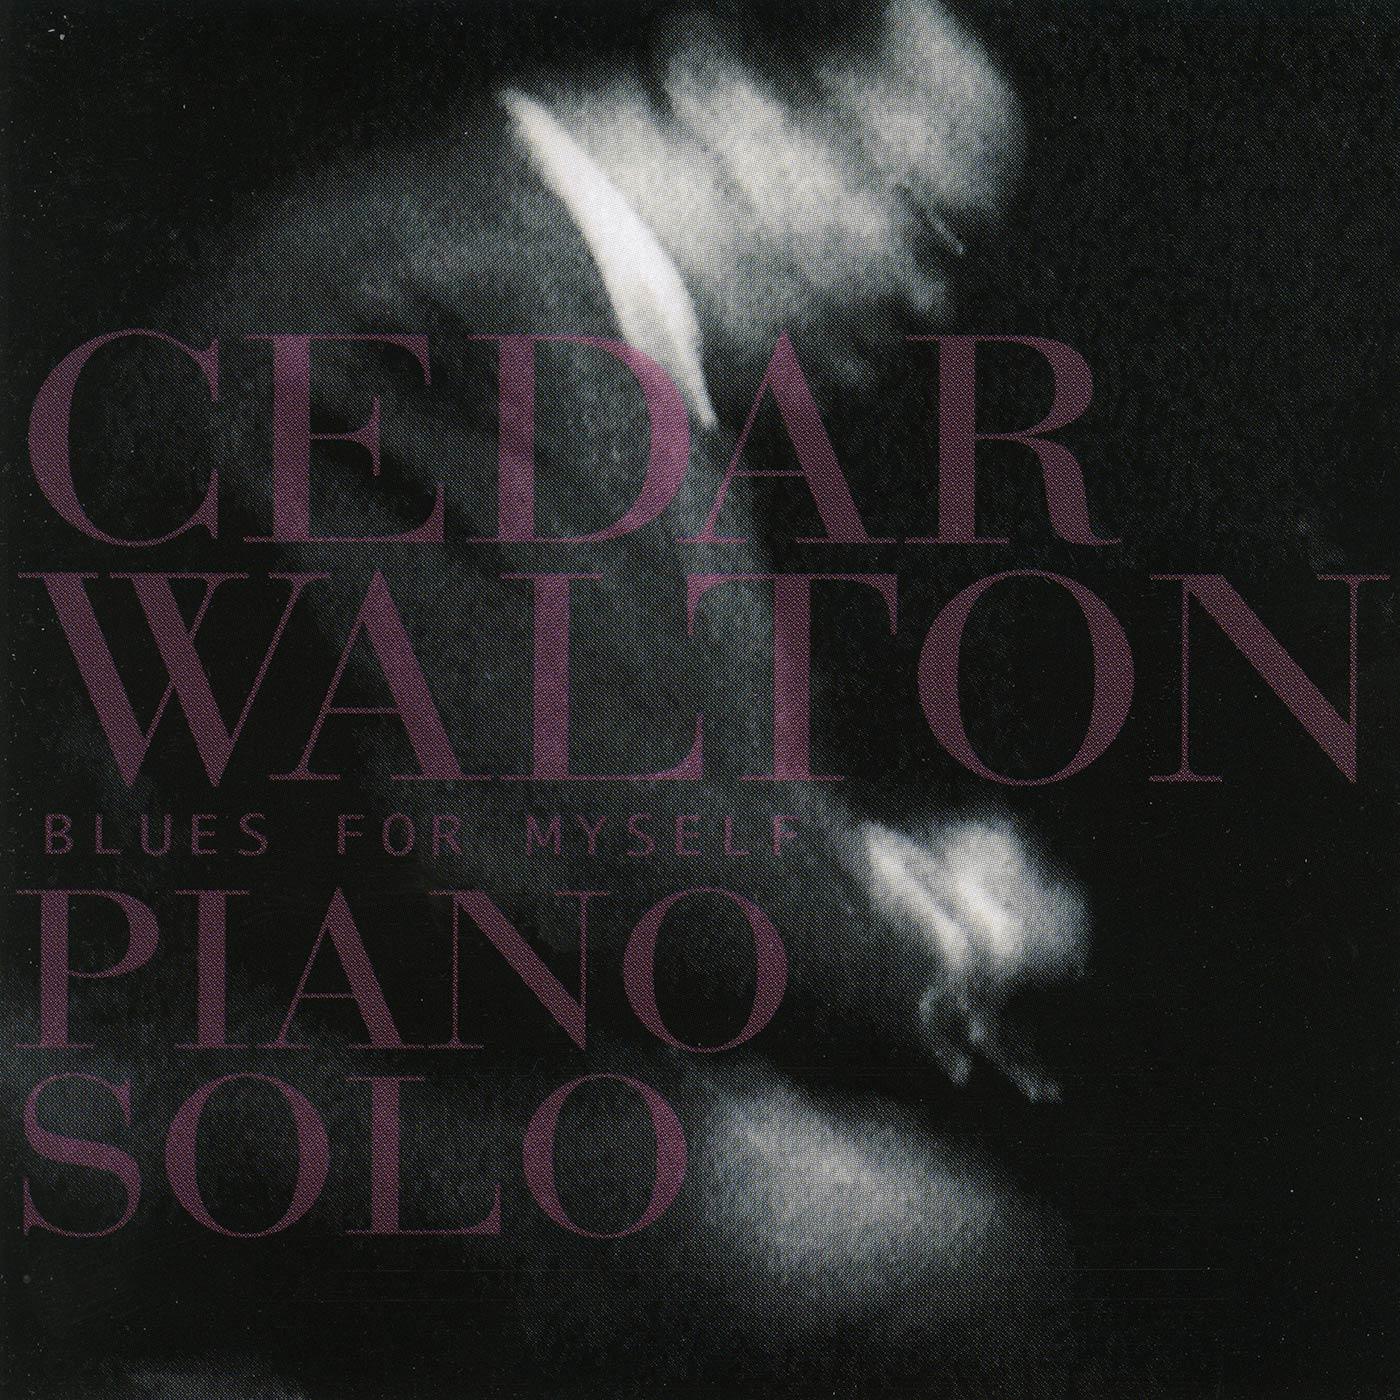 Blues For Myself - Cedar Walton Piano Solo